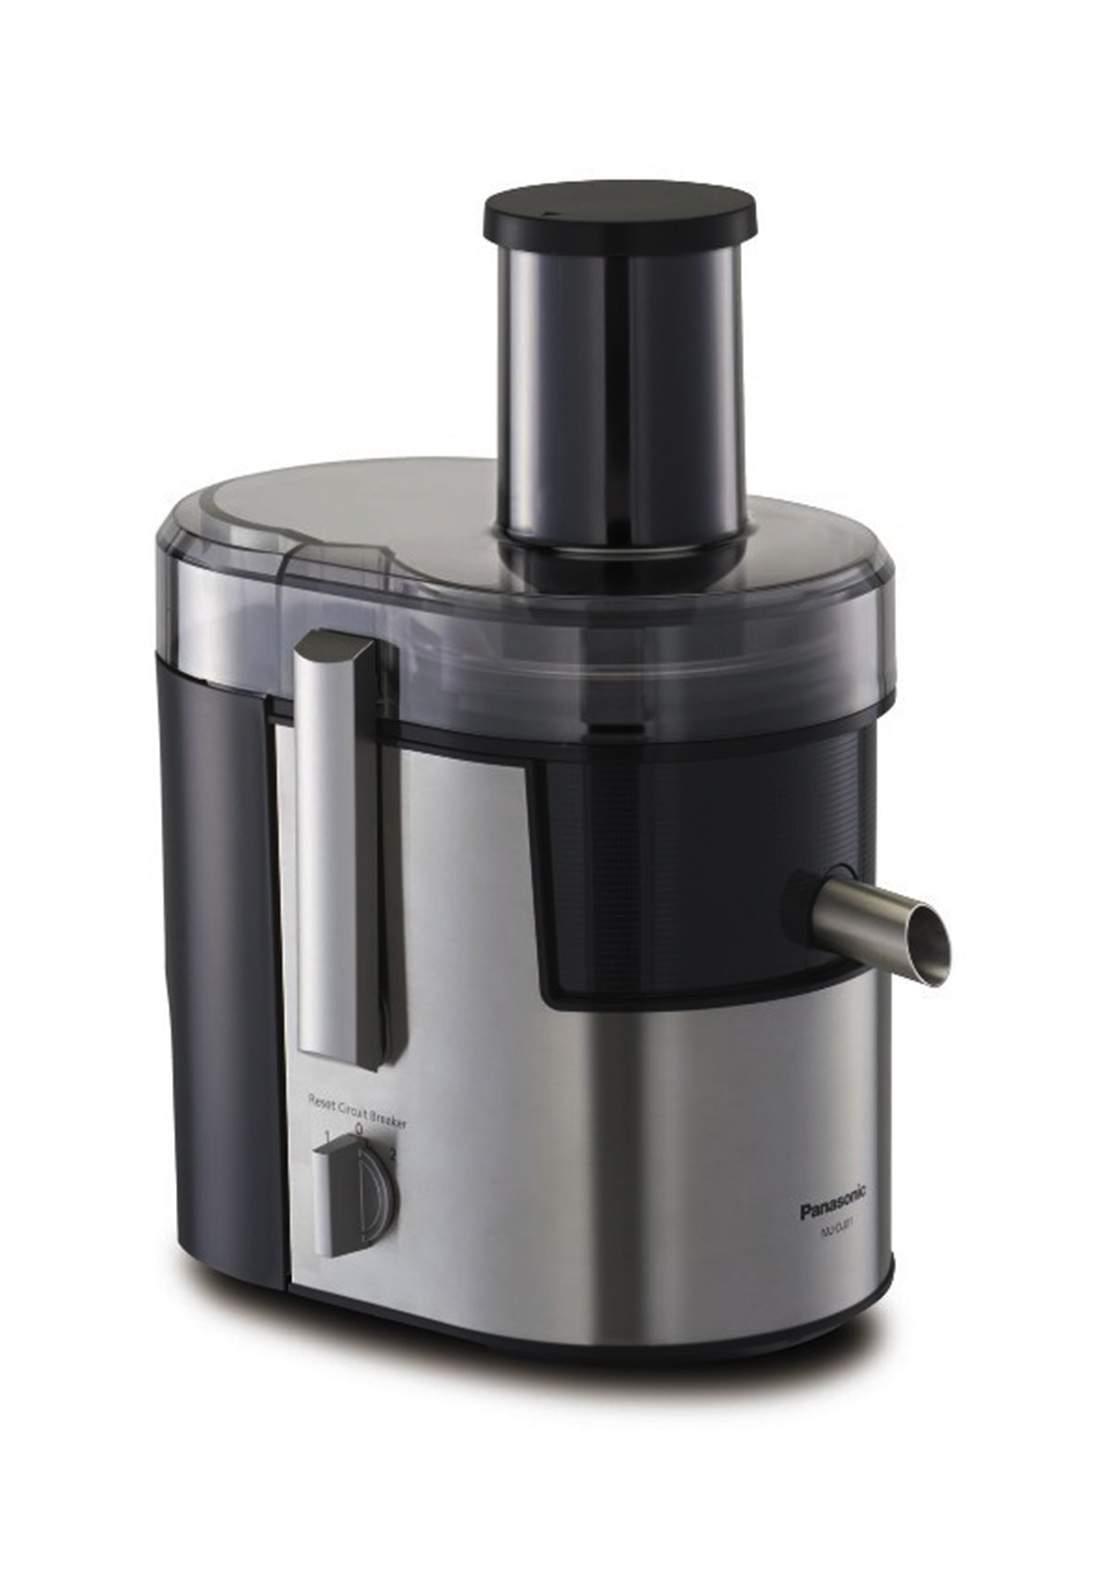 Panasonic-MJ-DJ01STN. Juicer  2L 800W خلاط كهربائي